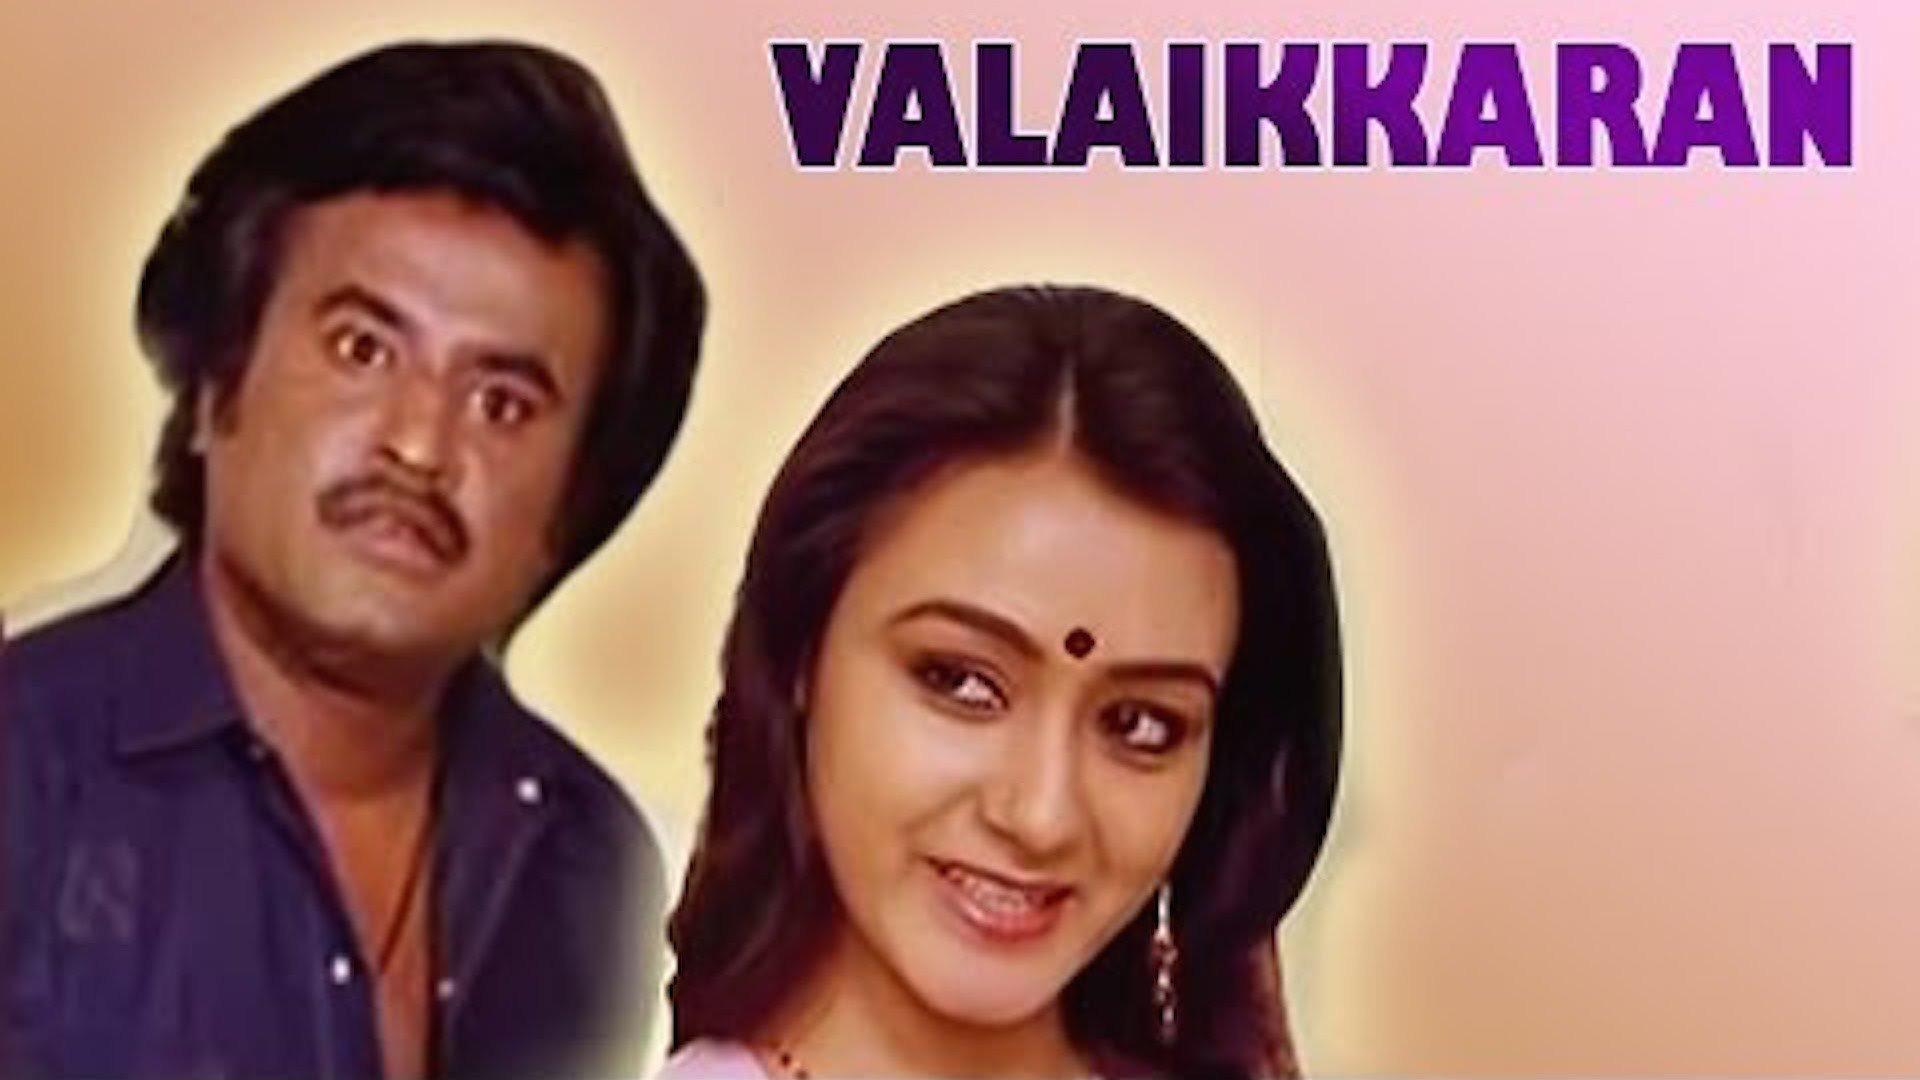 velaikaran full movie tamil download in kutty web